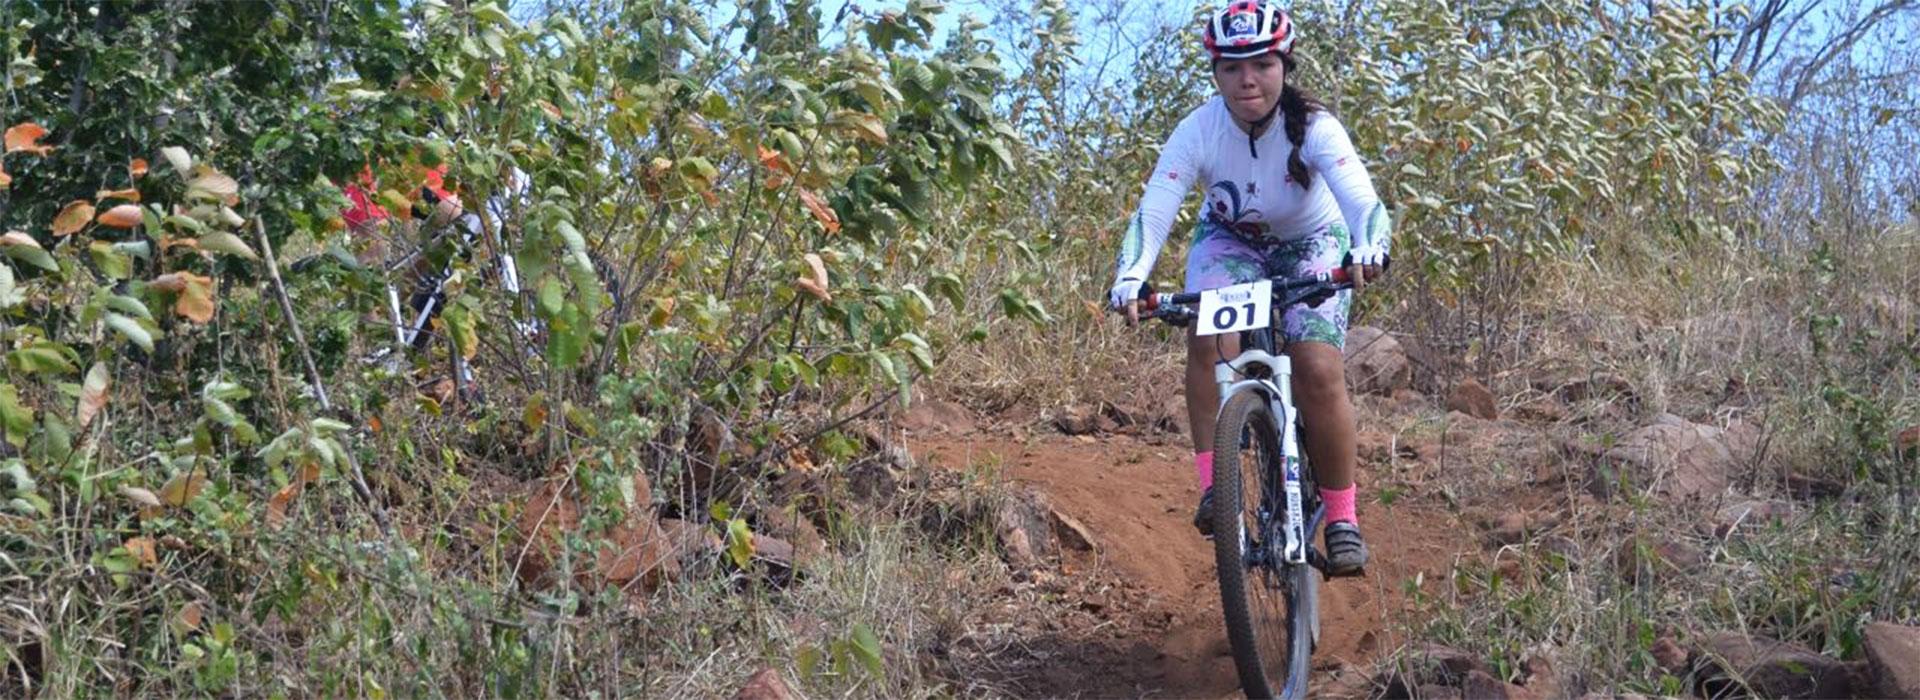 sistime-capa-maratona-pedal-caatinga-2016